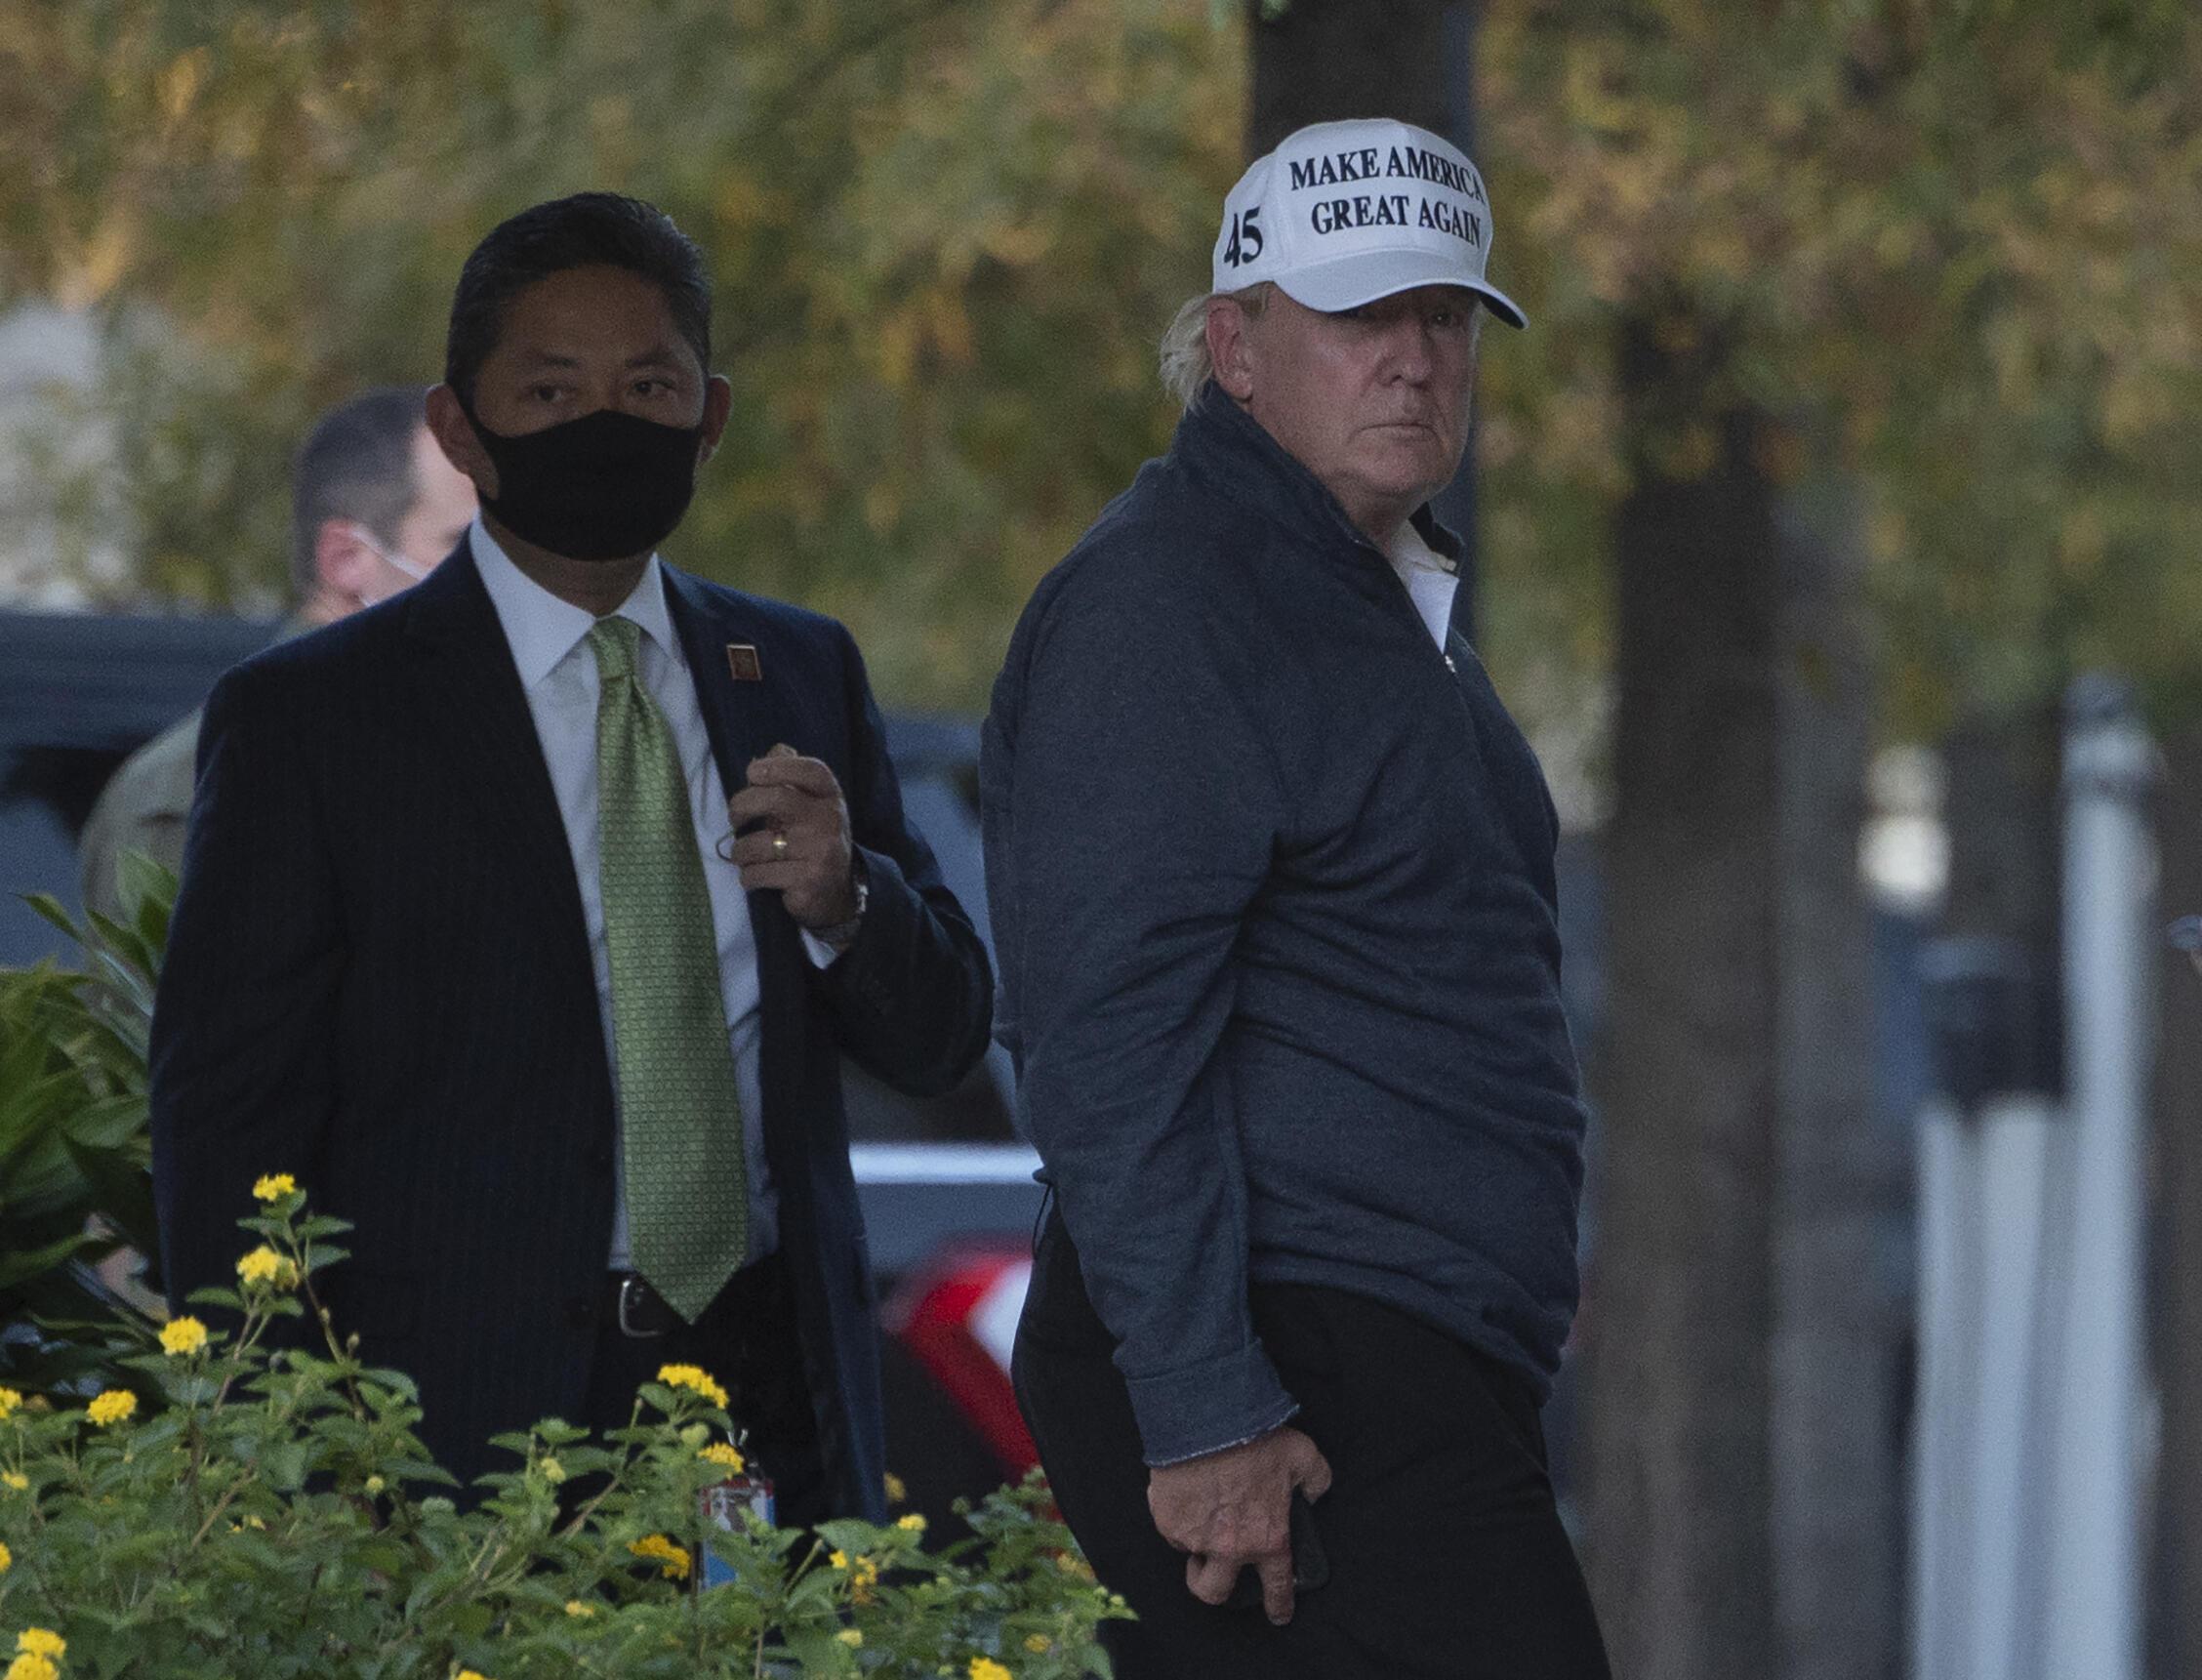 Presidente cessante, Donald Trump, voltou a recusar vitória anunciada de Joe Biden nas presidenciais